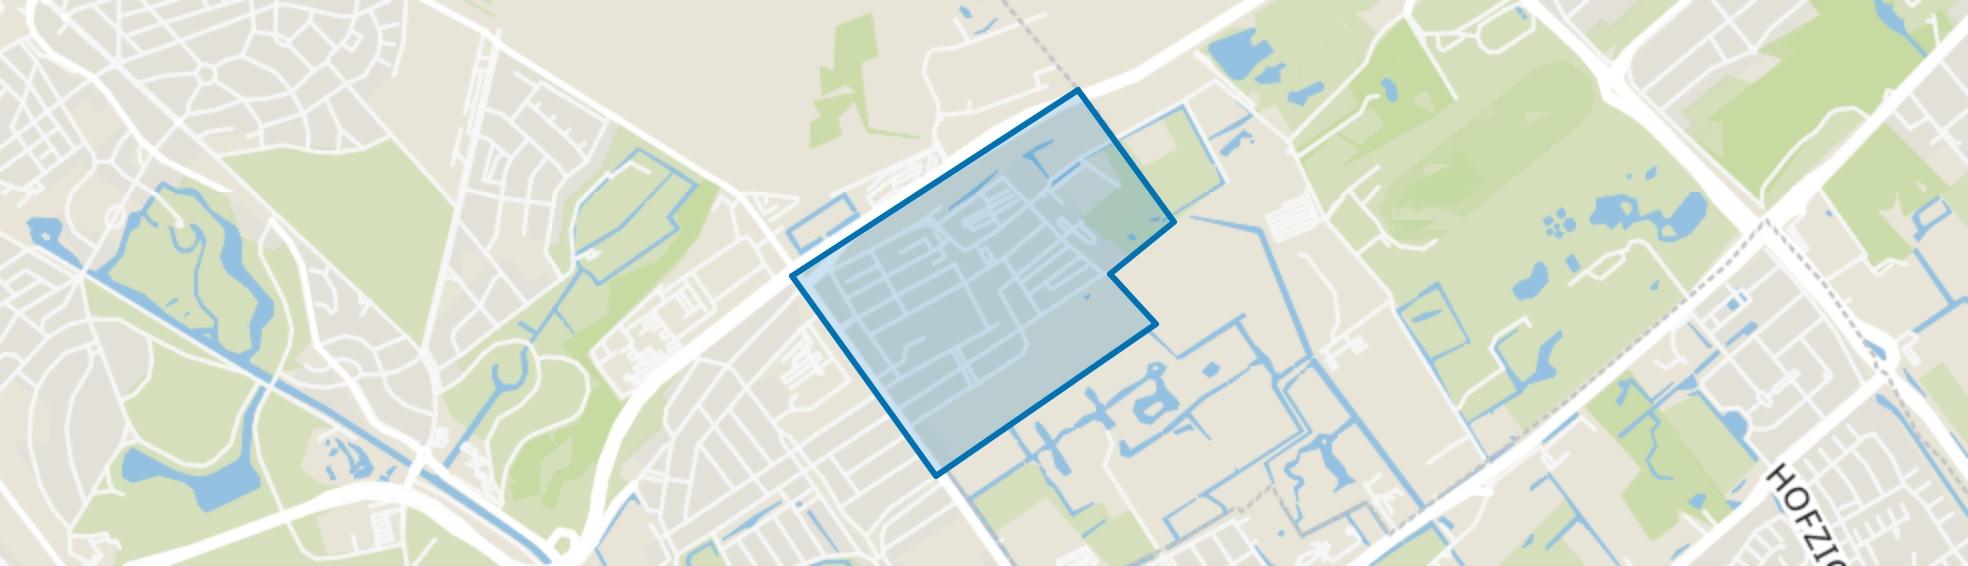 Duinzigt, Den Haag map